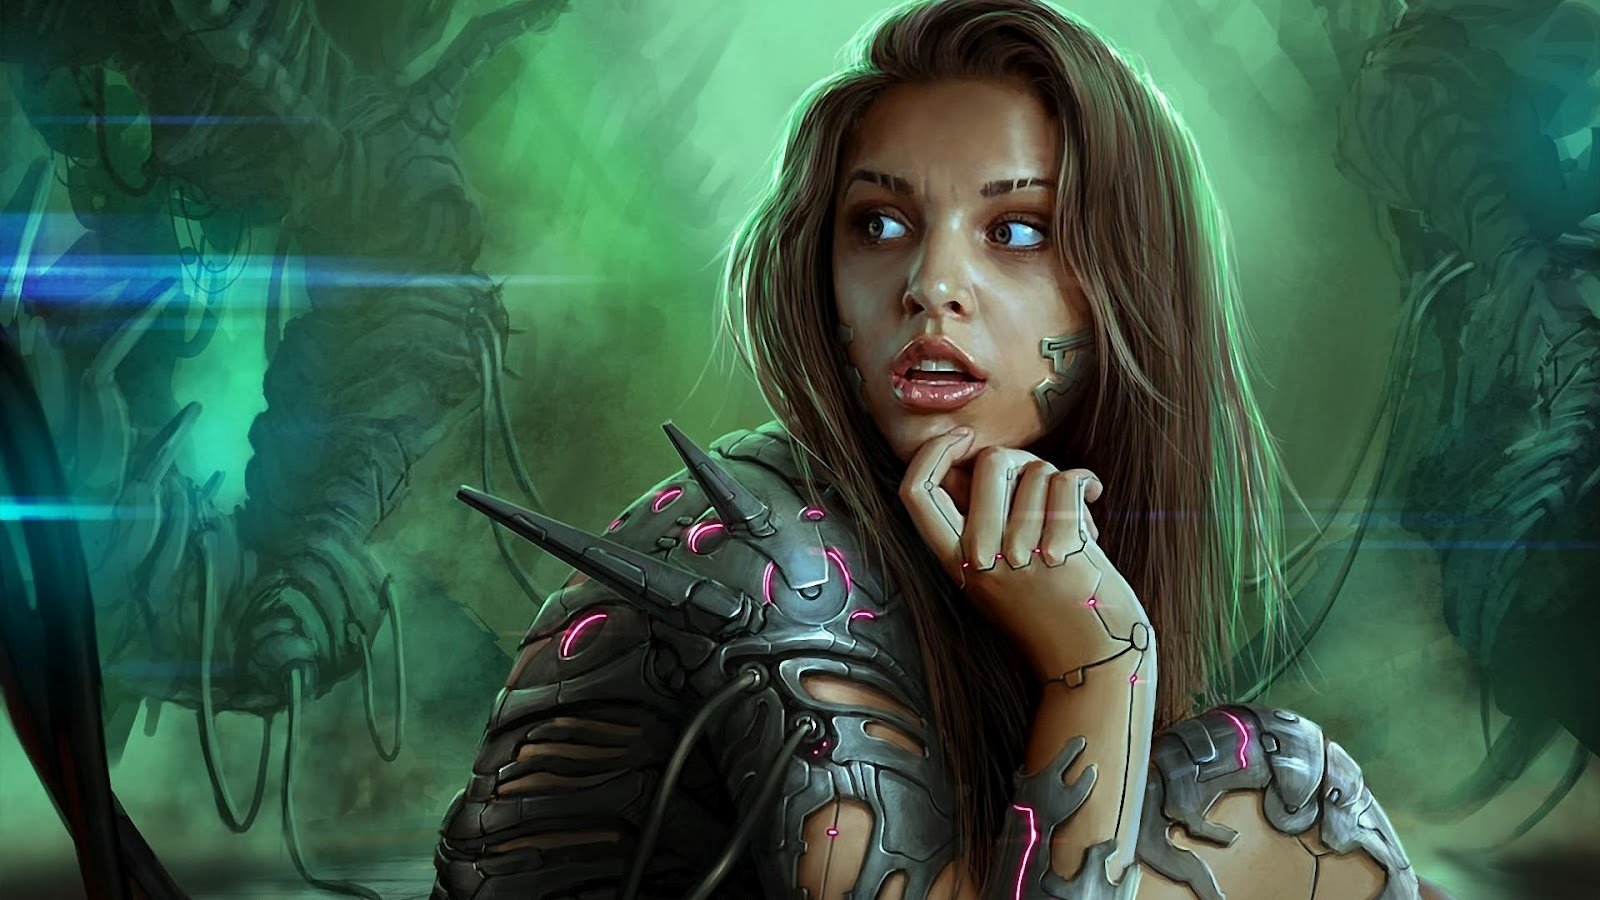 http://1.bp.blogspot.com/-dwLogDQnUx8/UOKAiZqDwAI/AAAAAAAAHeE/eWDDLxiYzGo/s1600/cyborg-woman-1080.jpg